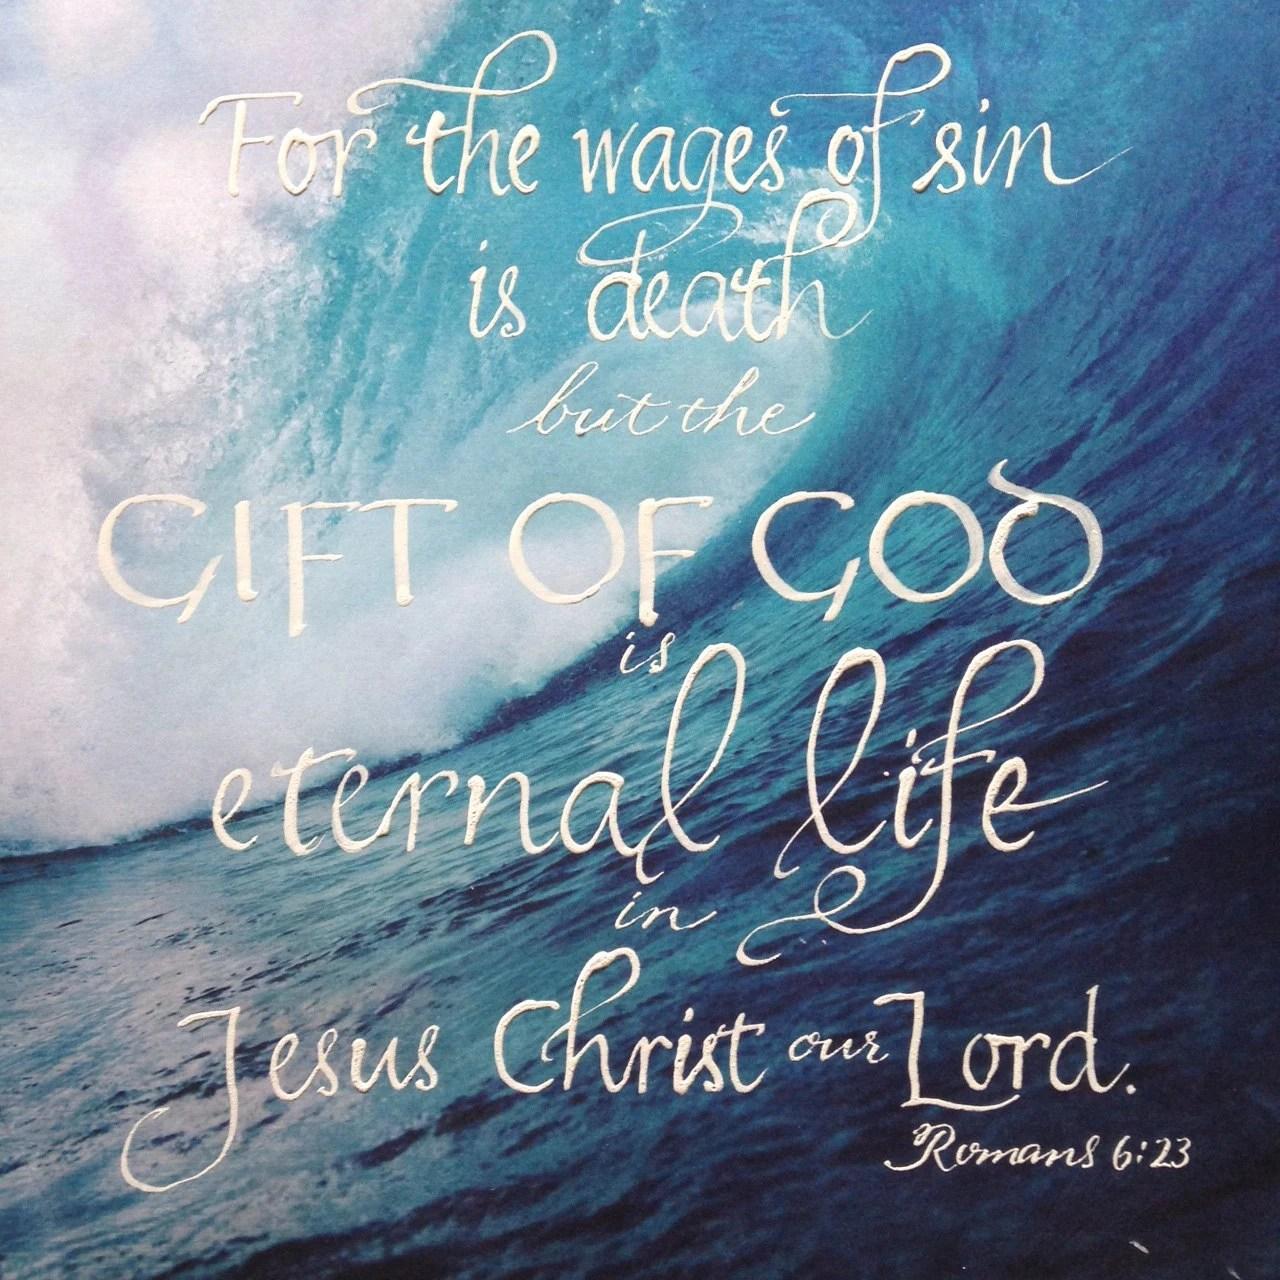 Encouraging Quotes Wallpaper Free Download Church Art Water Art Christian Decor Bible Verse Art